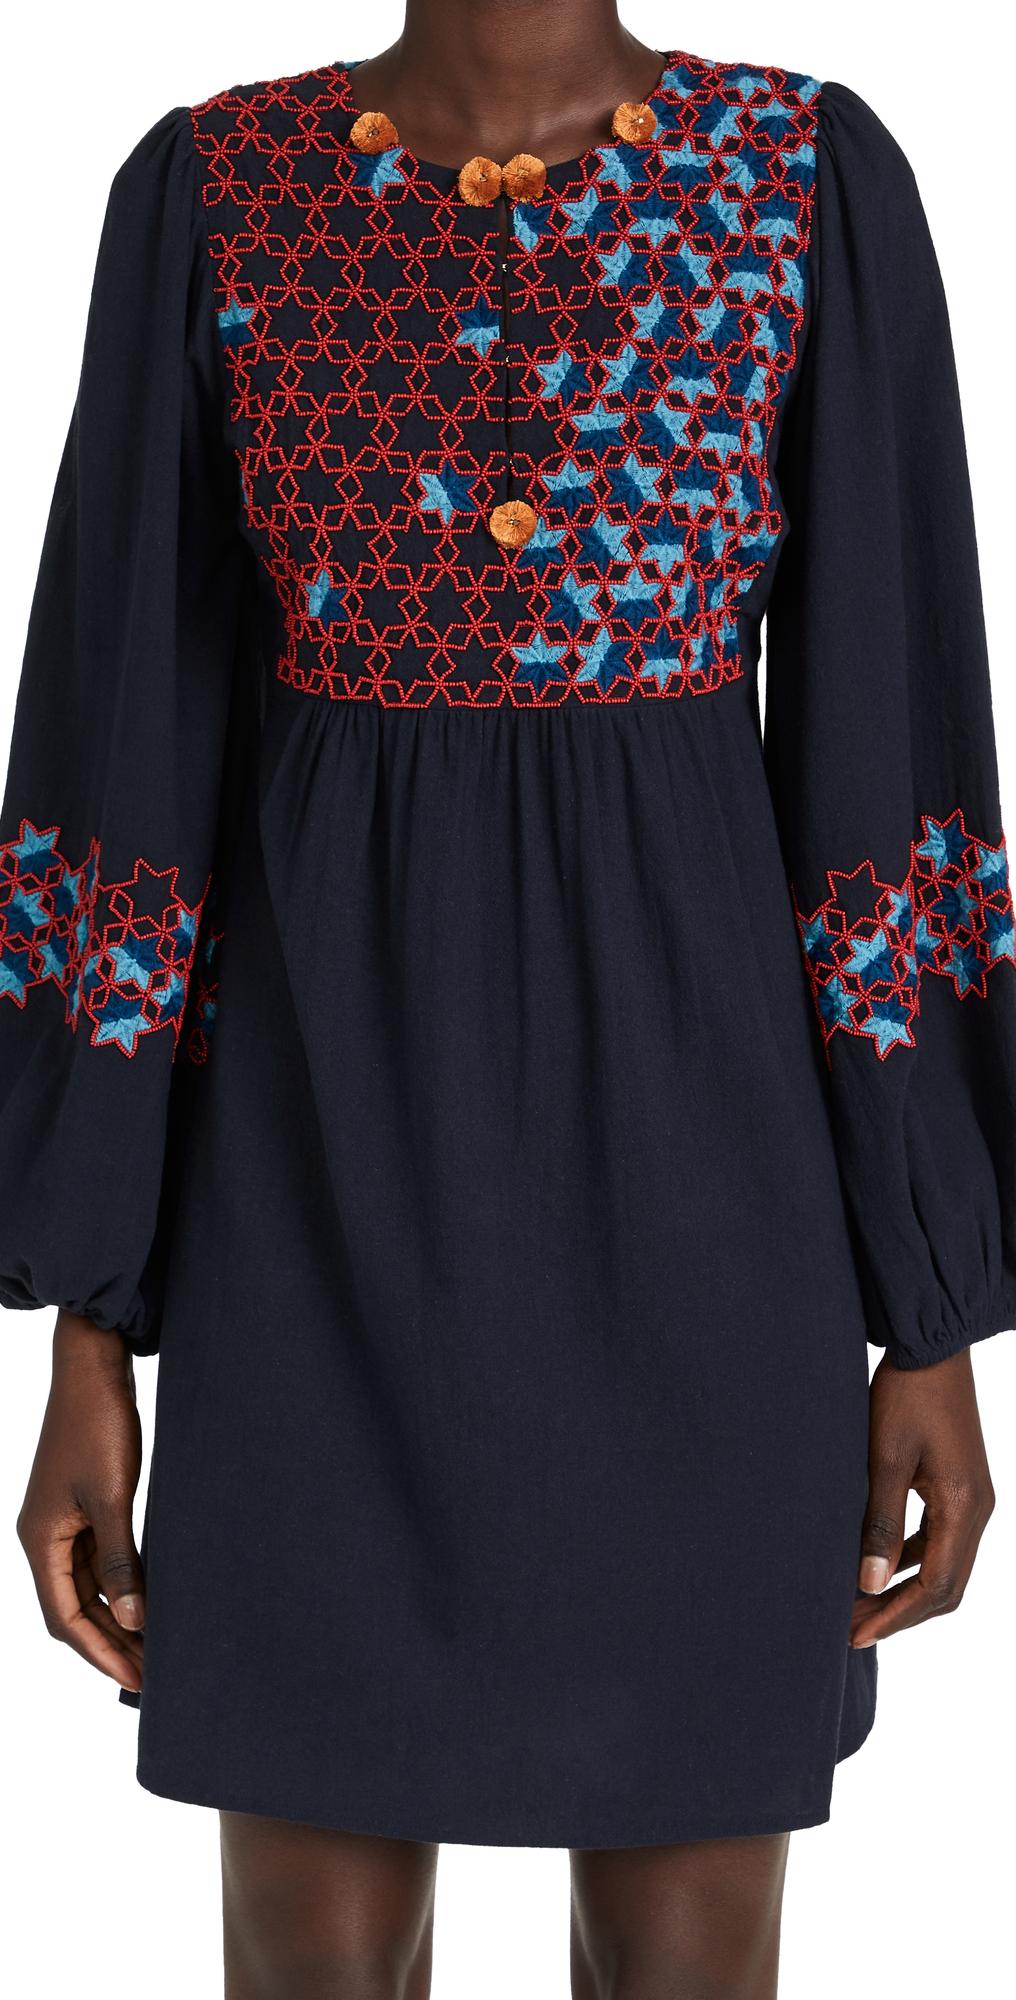 Lucie Mini Dress